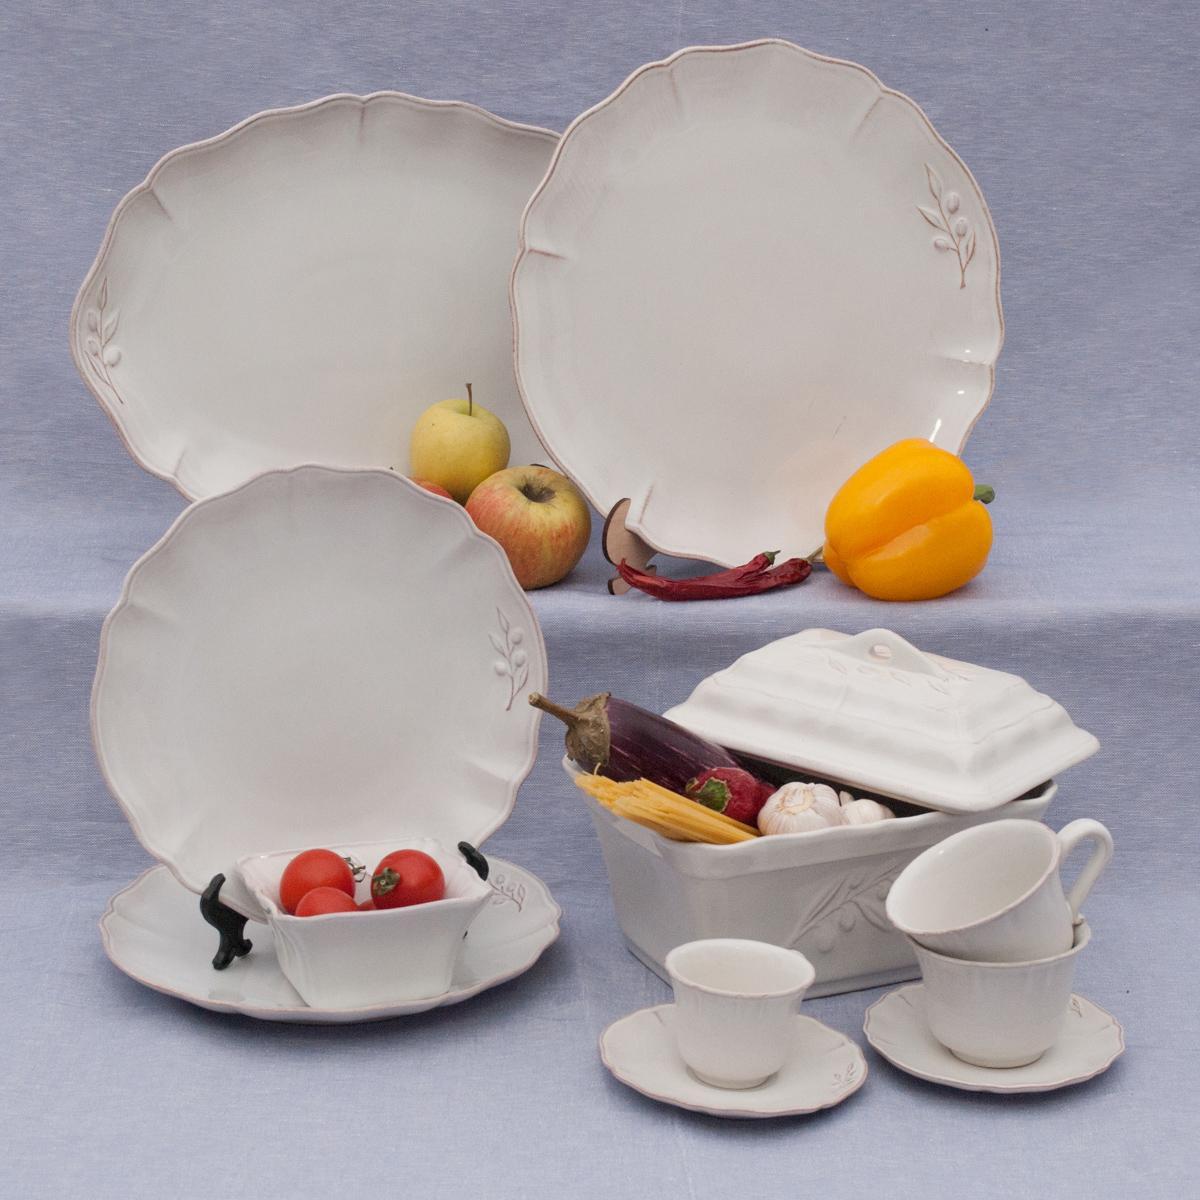 Коллекция посуды Alentejo  - фото